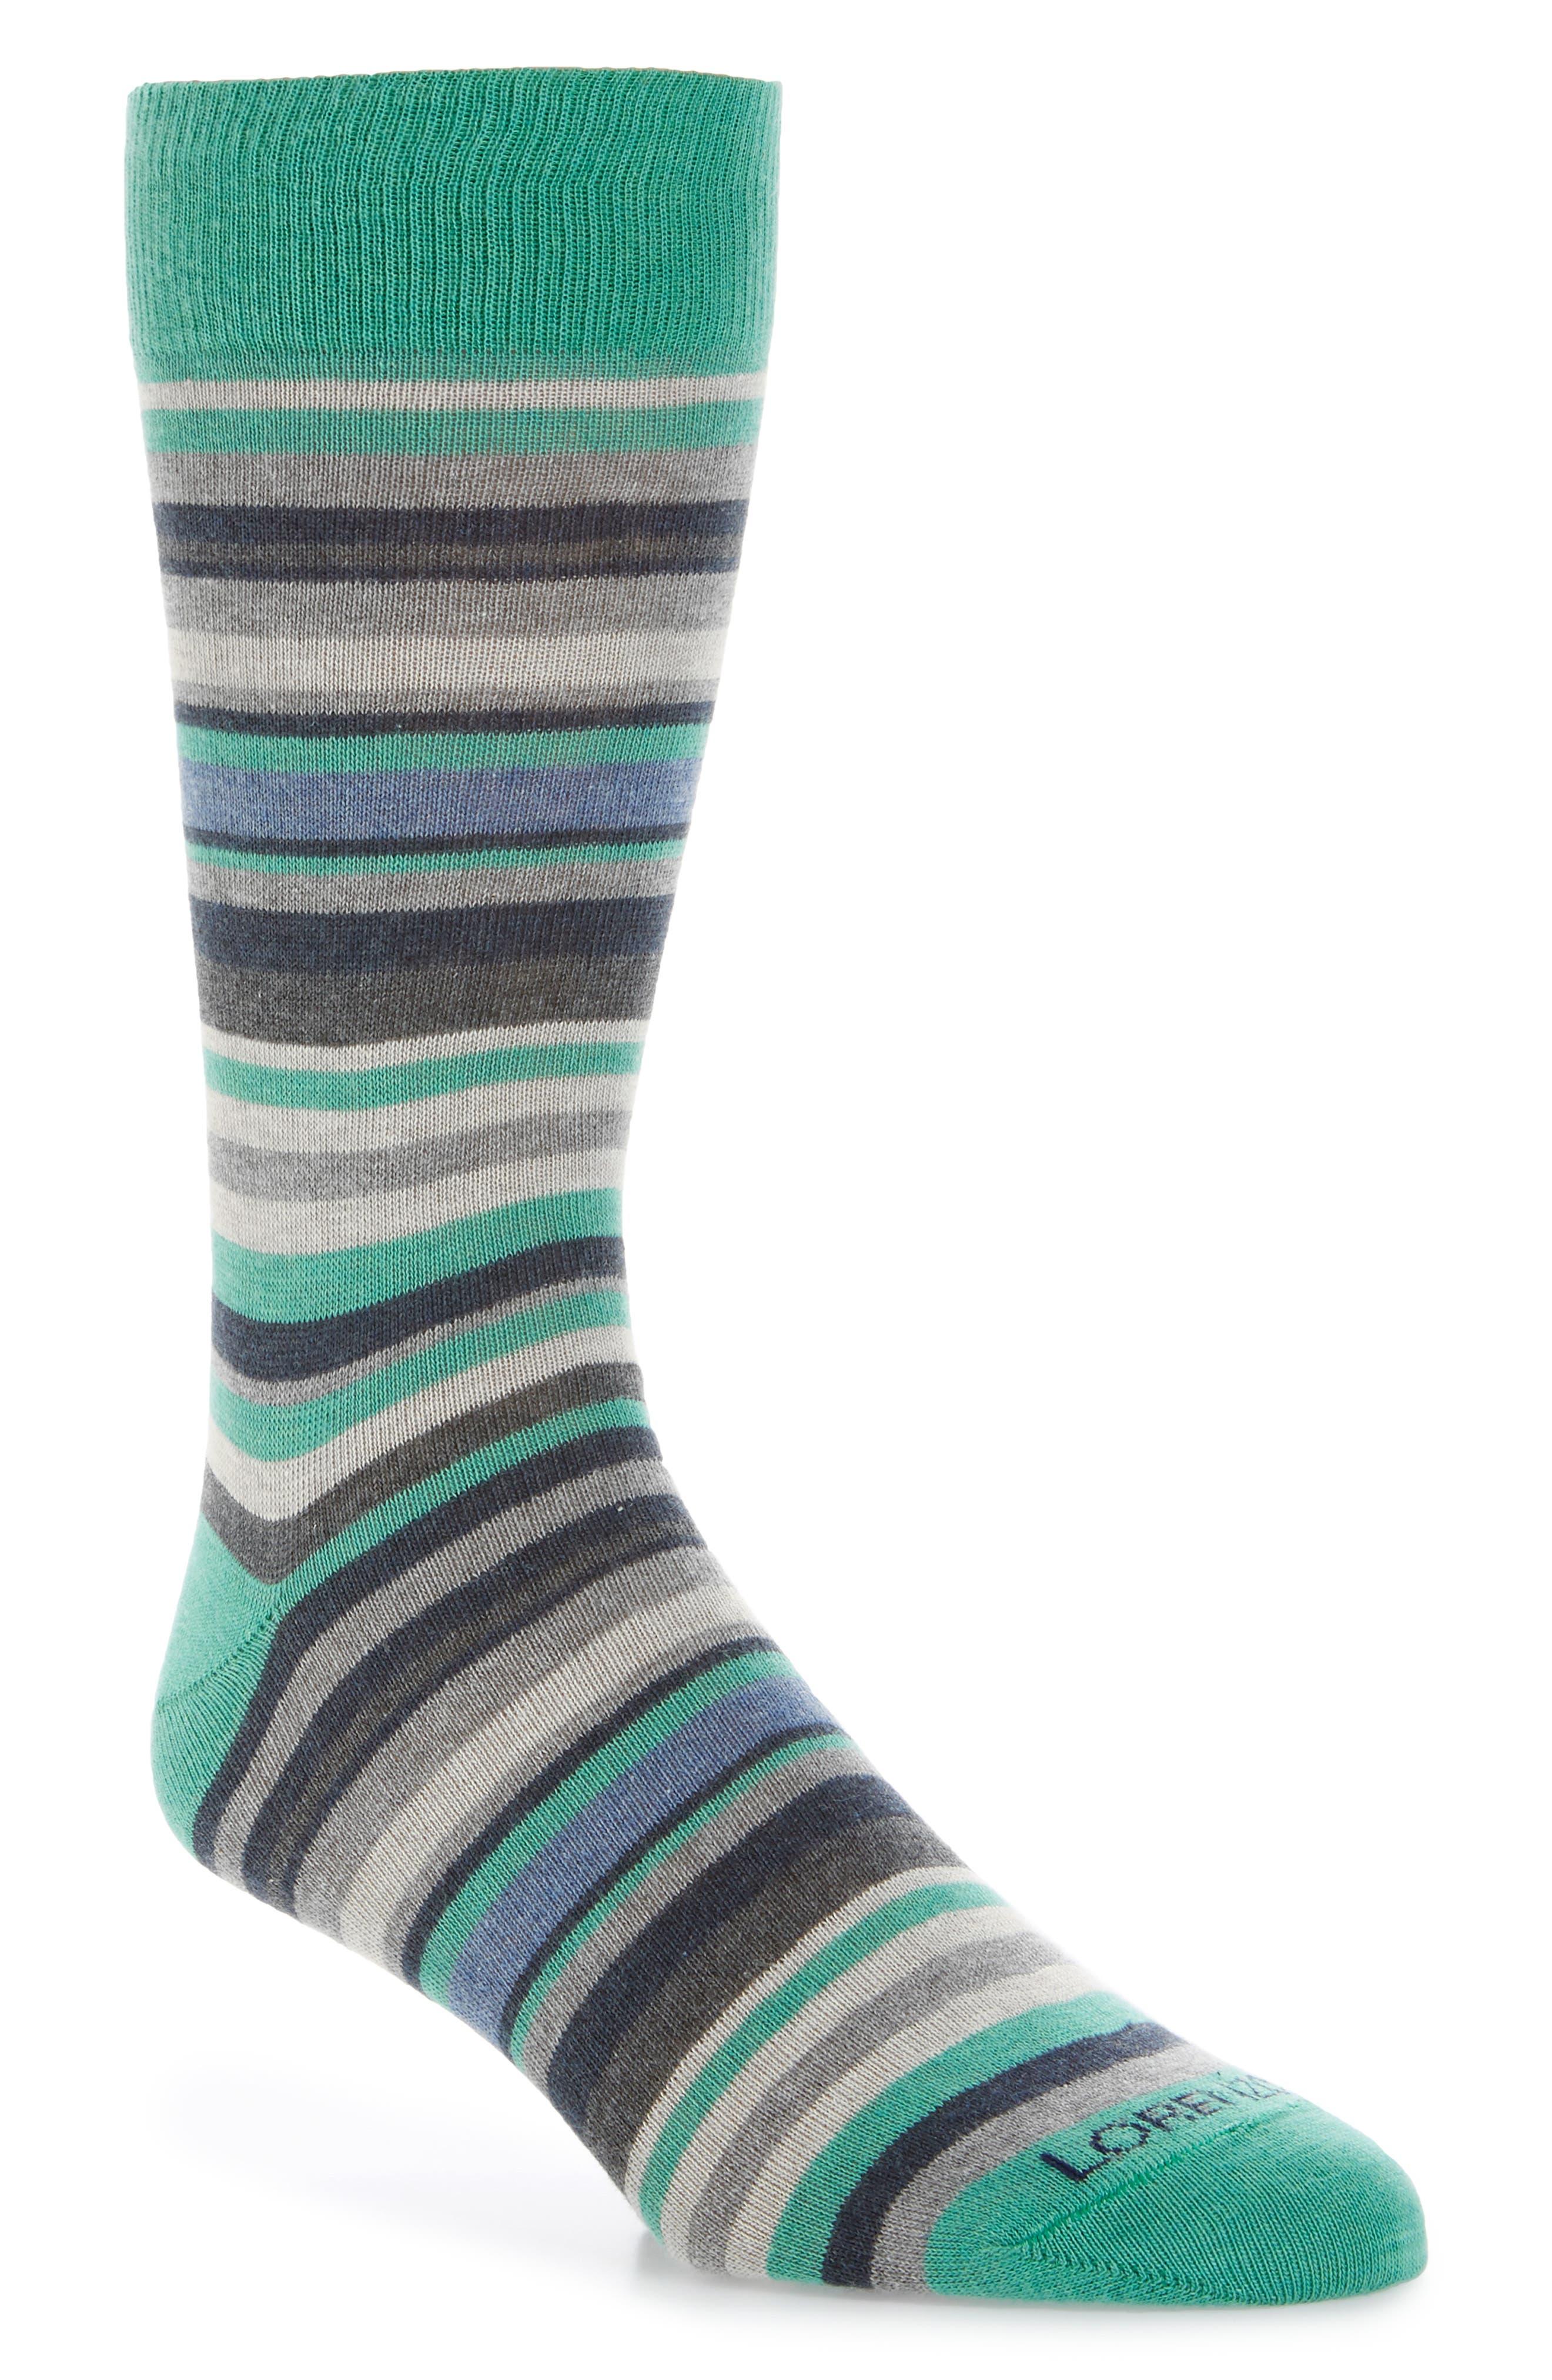 Lorenzo Uomo Stripe Cotton Blend Socks (3 for $30)